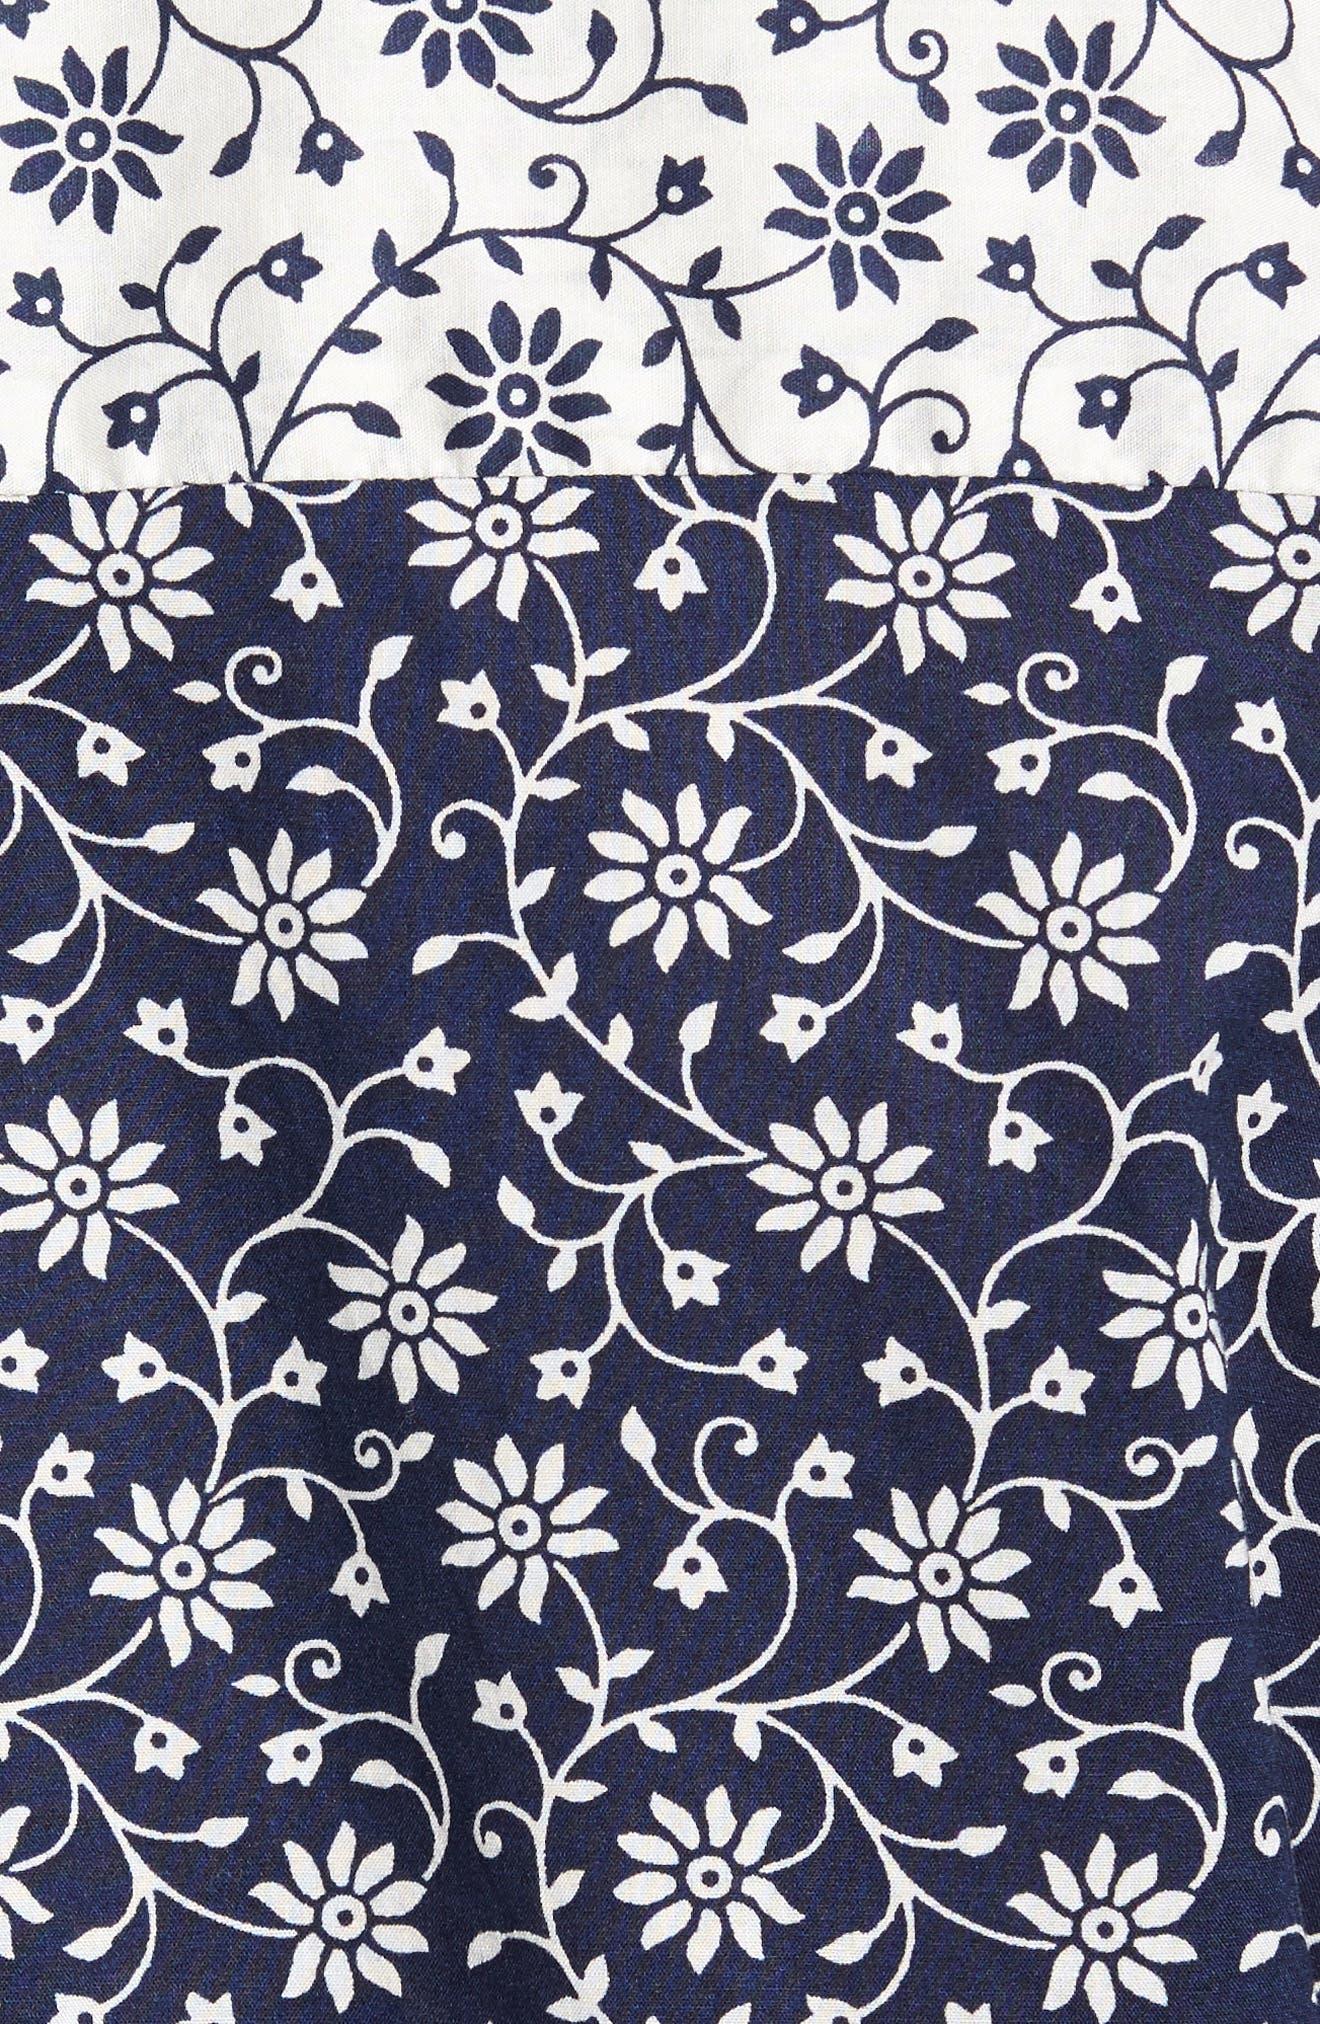 Mix & Match Print Woven Shirt,                             Alternate thumbnail 5, color,                             Combo A